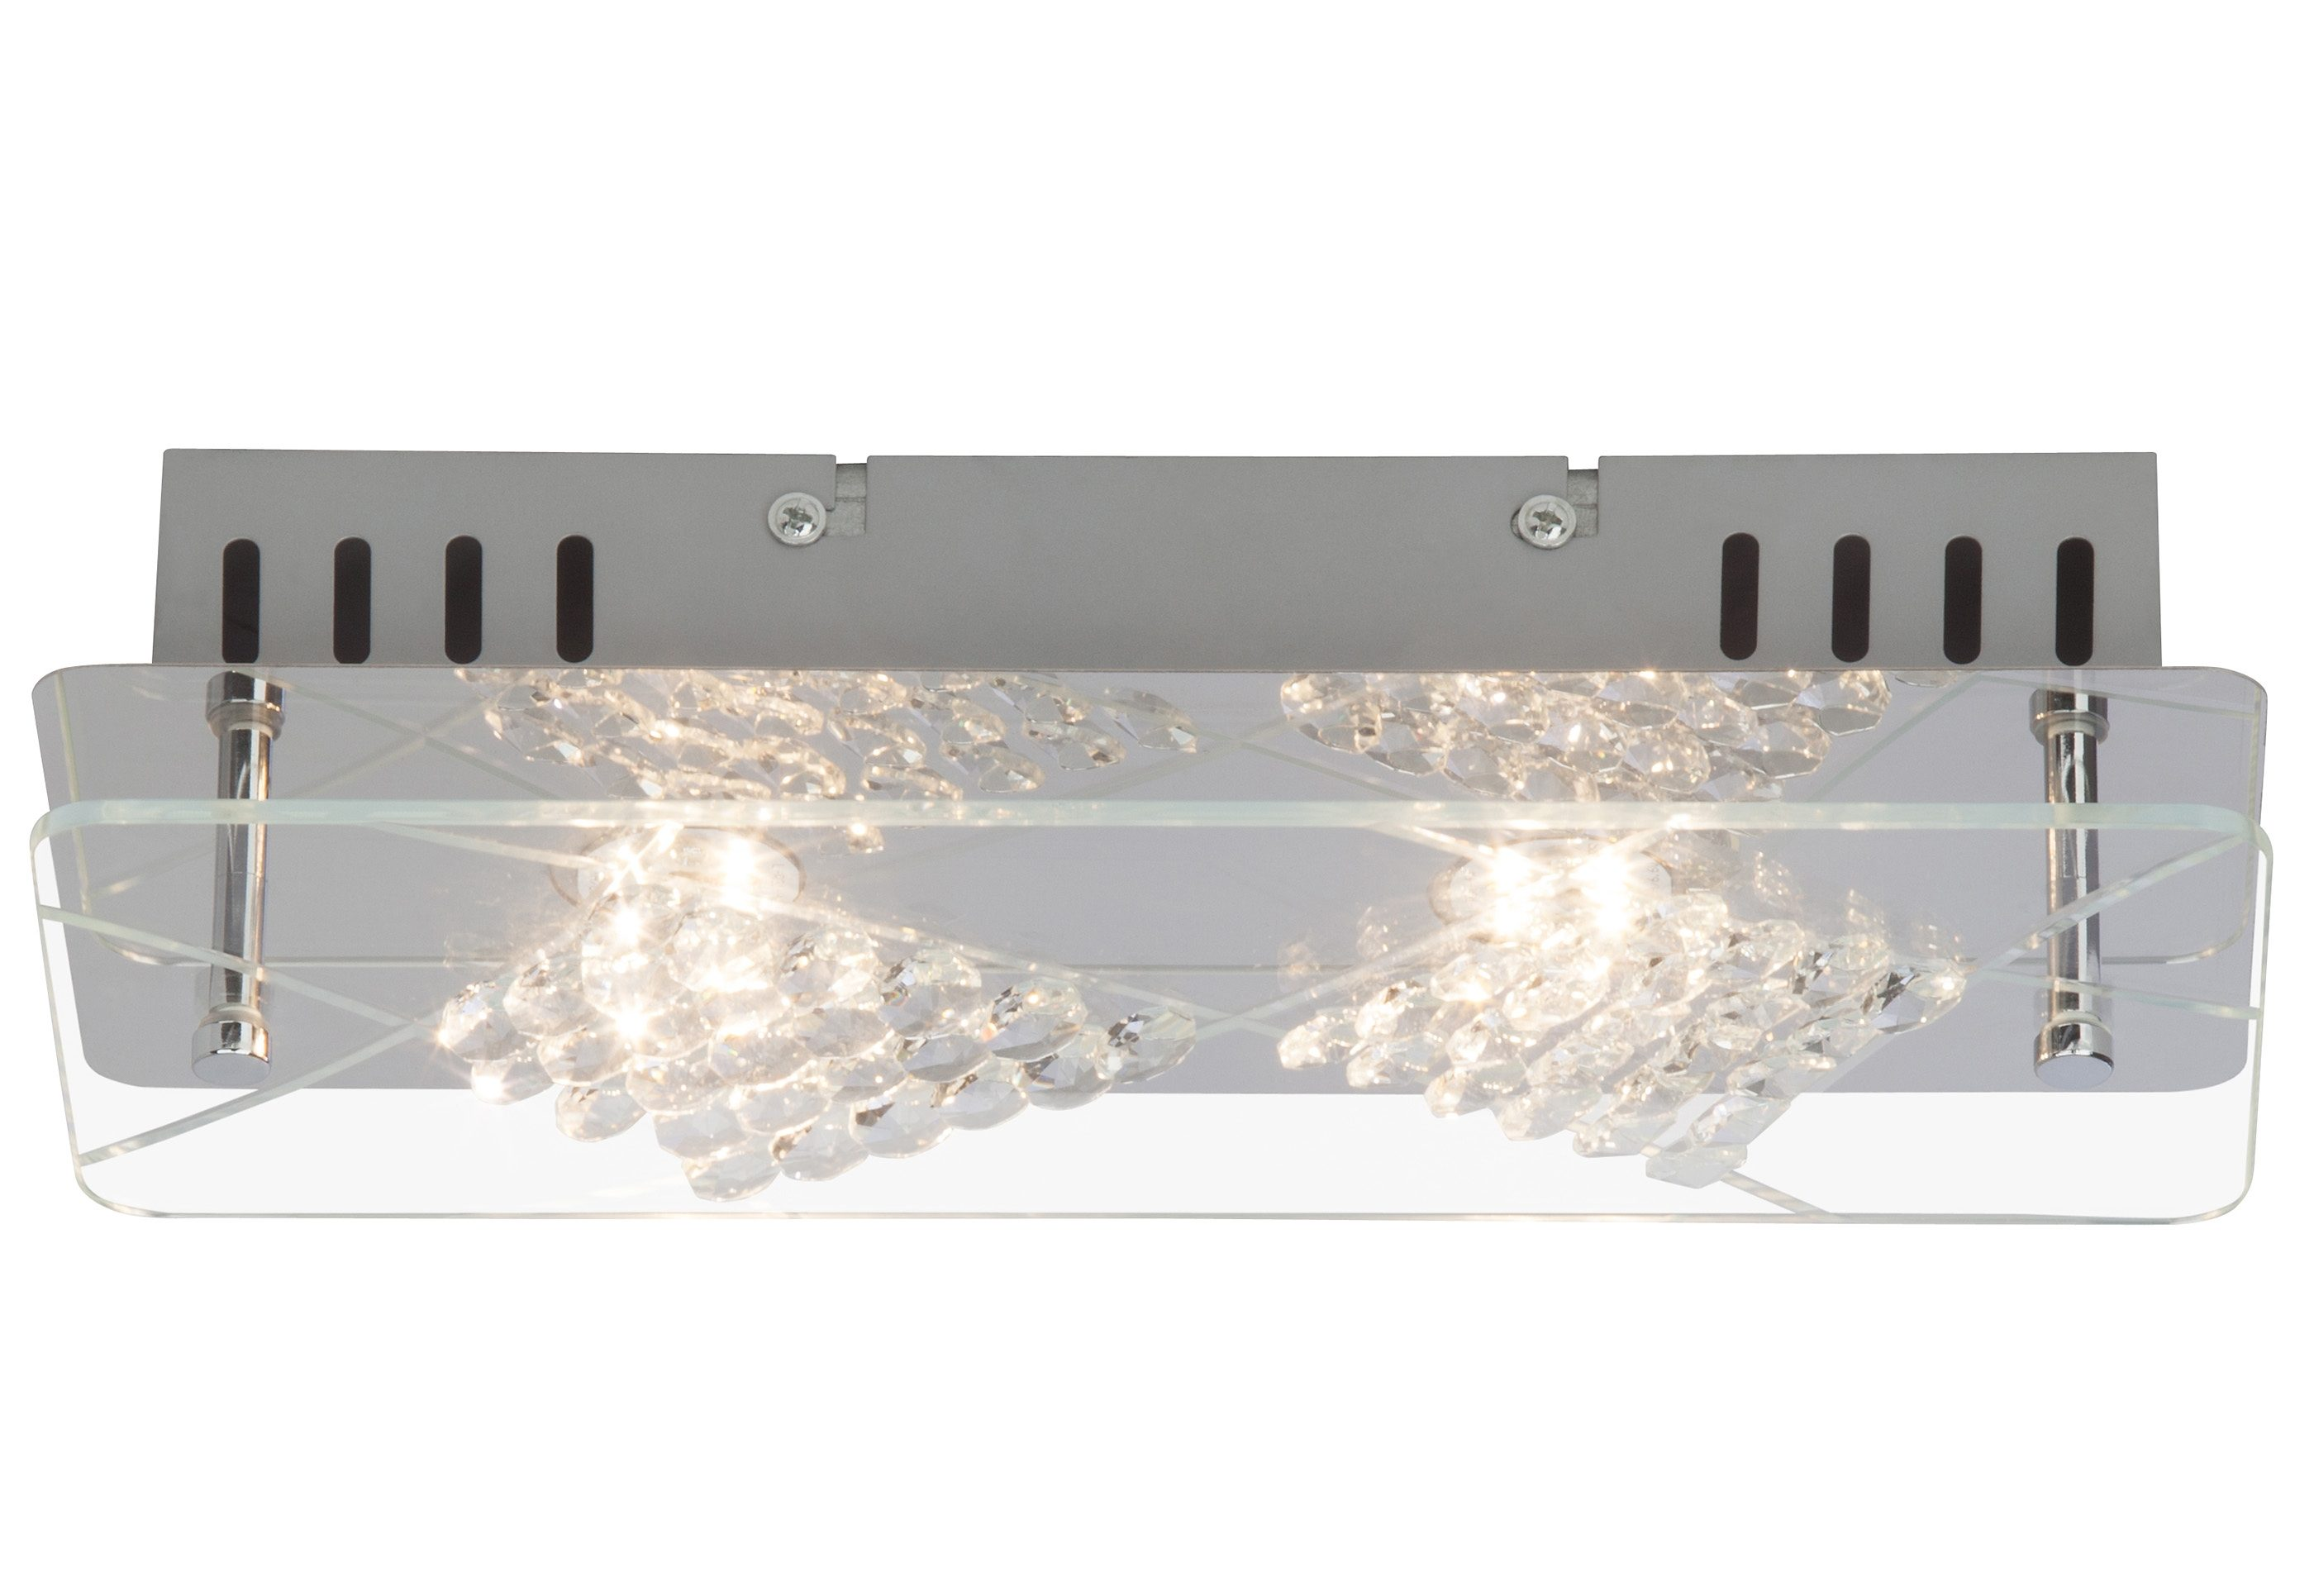 Brilliant Leuchten LED-Deckenleuchte, inkl. LED-Leuchtmittel, 2 flammig